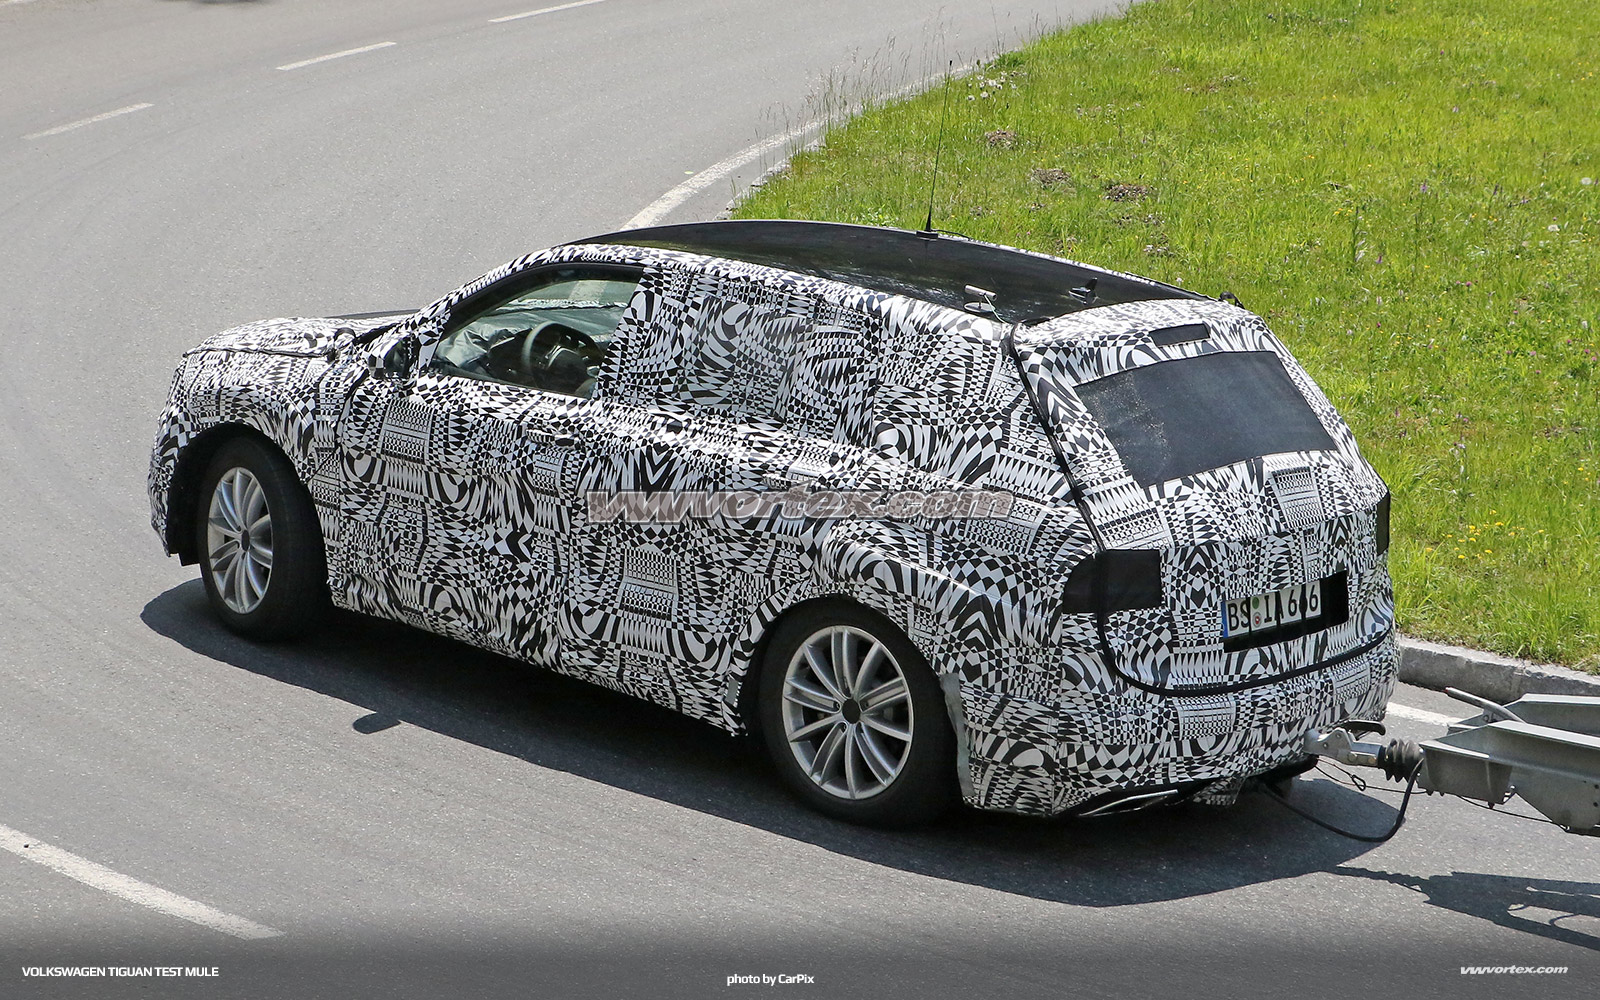 Audi Q2 test mule 4923 600x300 photo